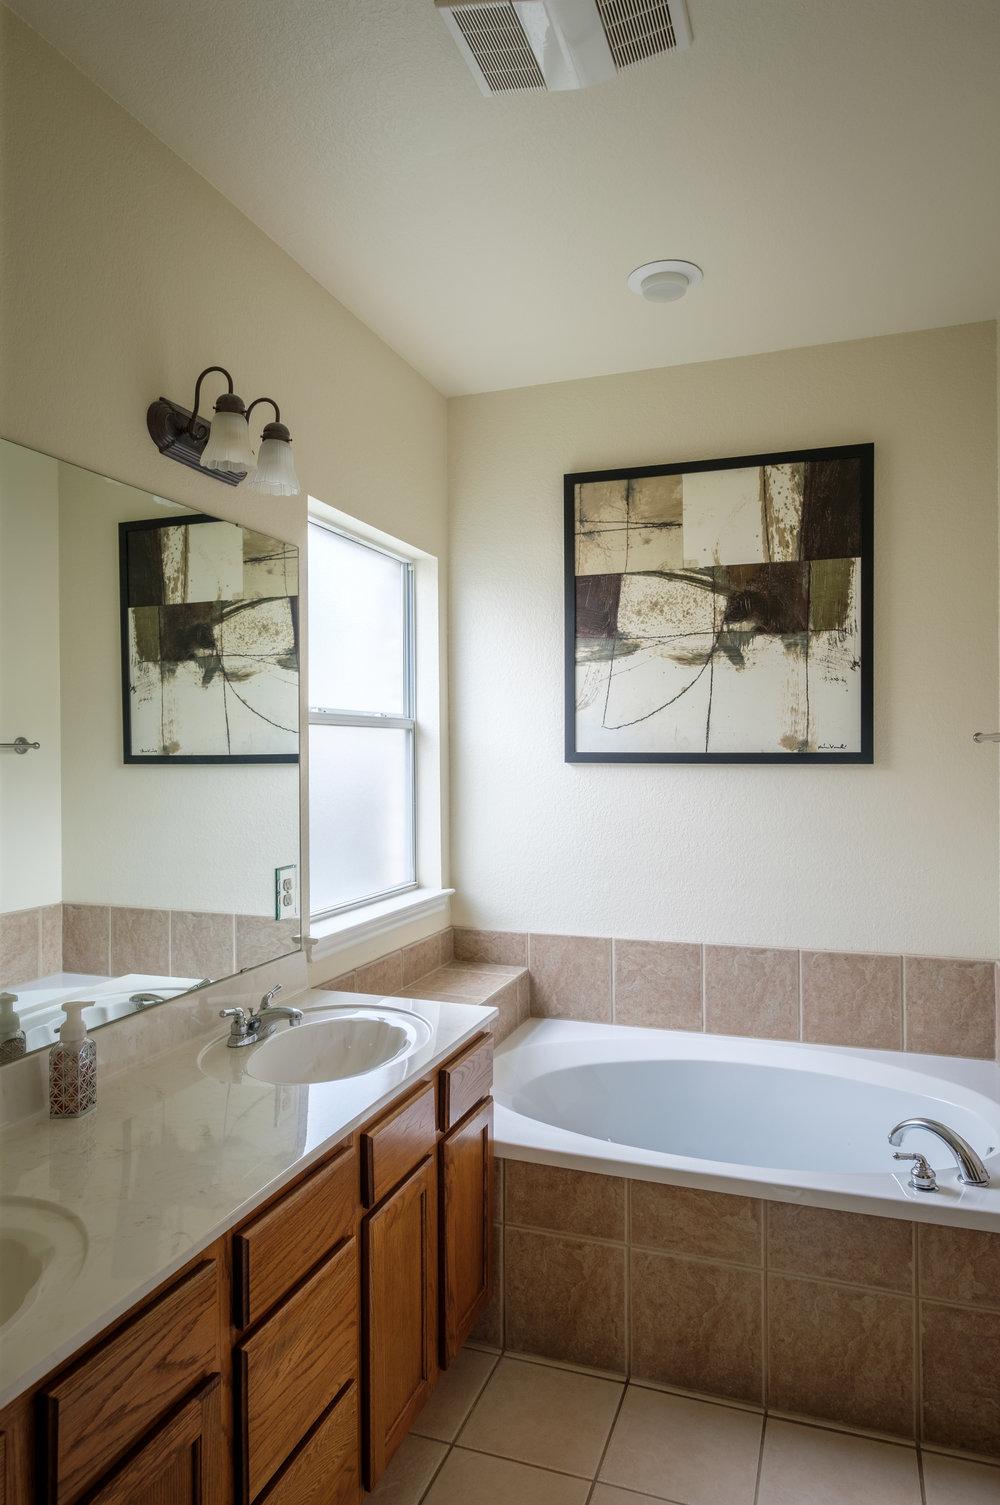 Real Estate Interior - Master Bathroom